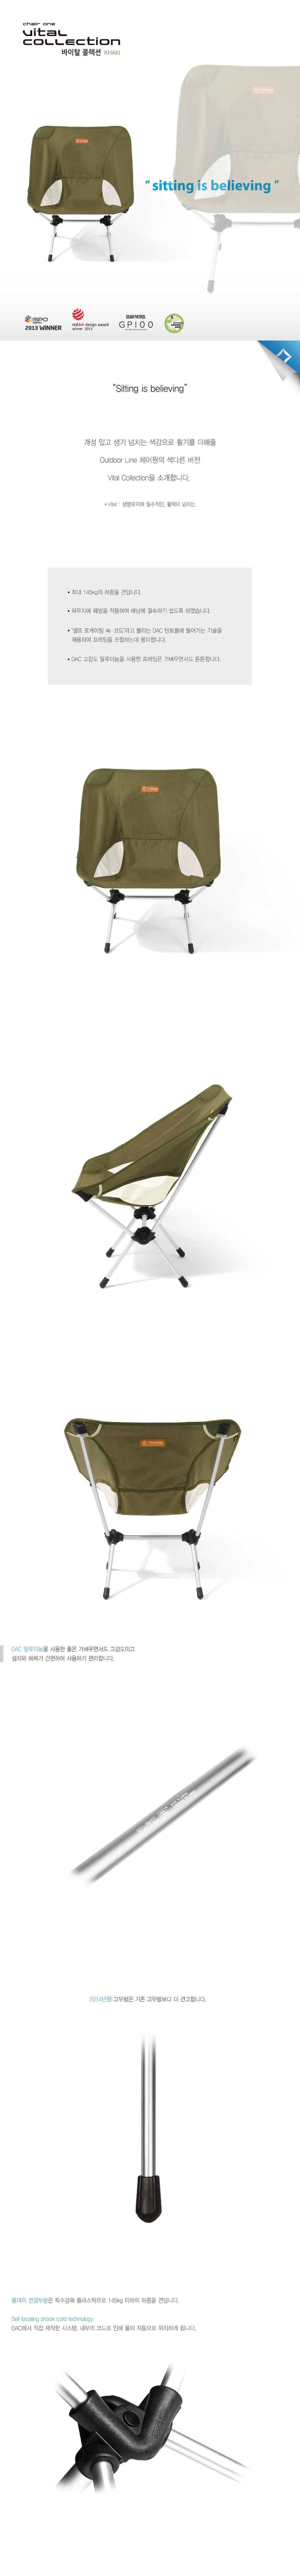 20171017-Helinox_chair-one_vital-collection-Khaki1.jpg